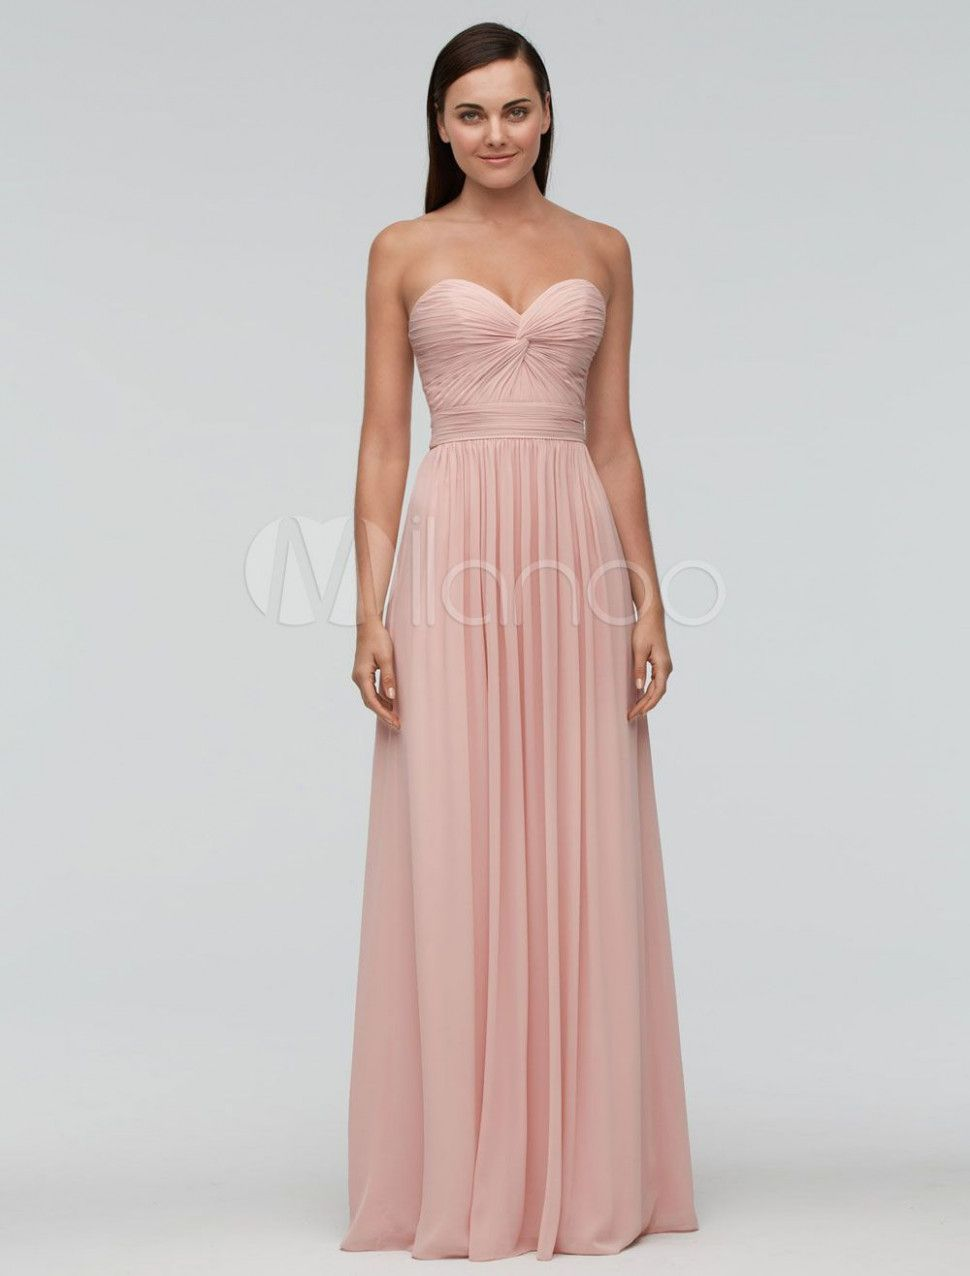 13 altrosa kleid lang   rosa kleid hochzeitsgast, kleid